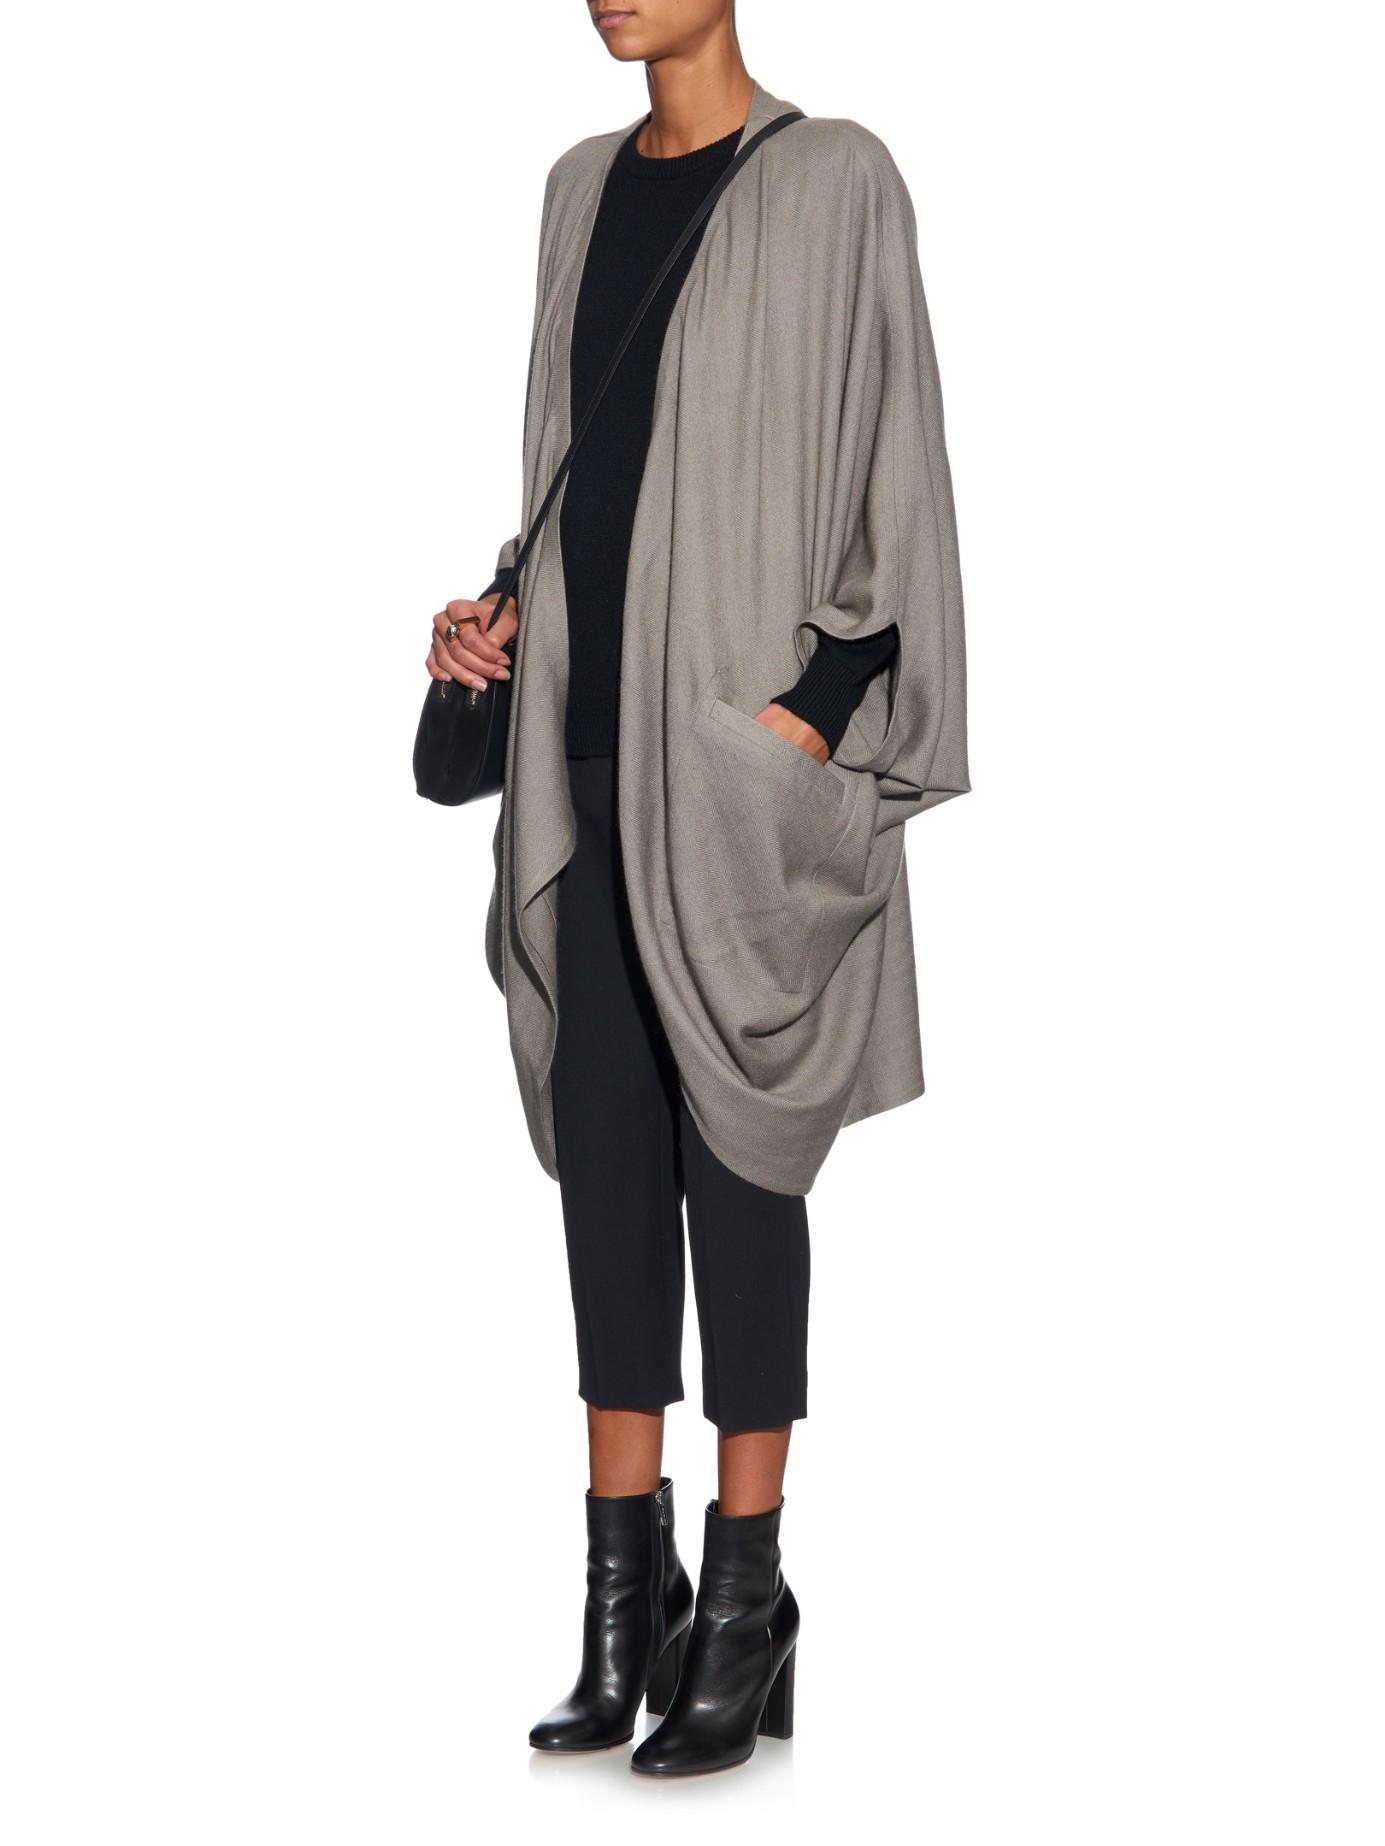 Denis colomb Hand-woven Cashmere Kimono Cardigan in Gray   Lyst